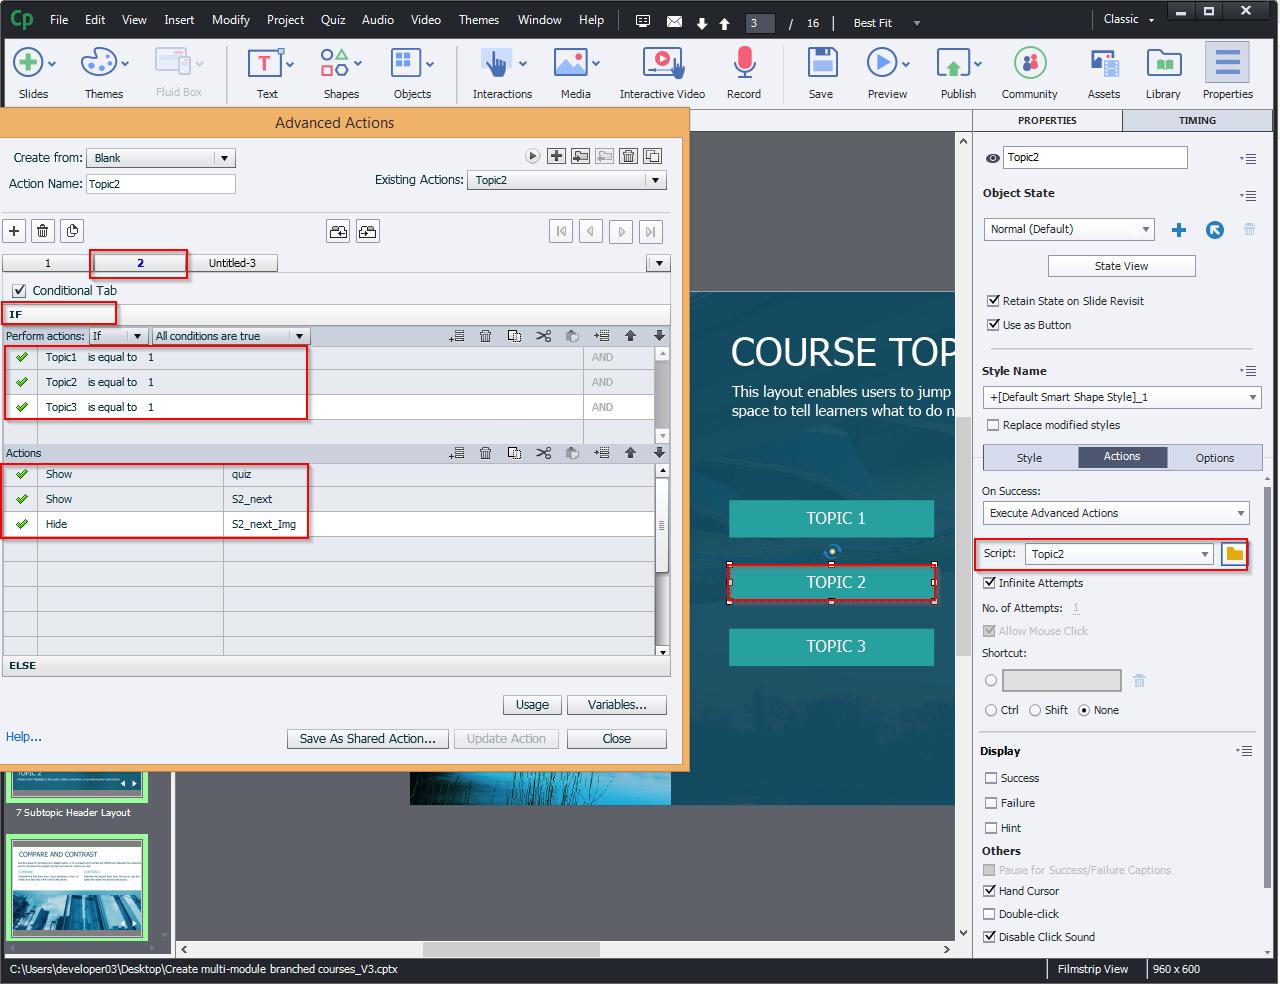 Create multi-module branched courses 10.4